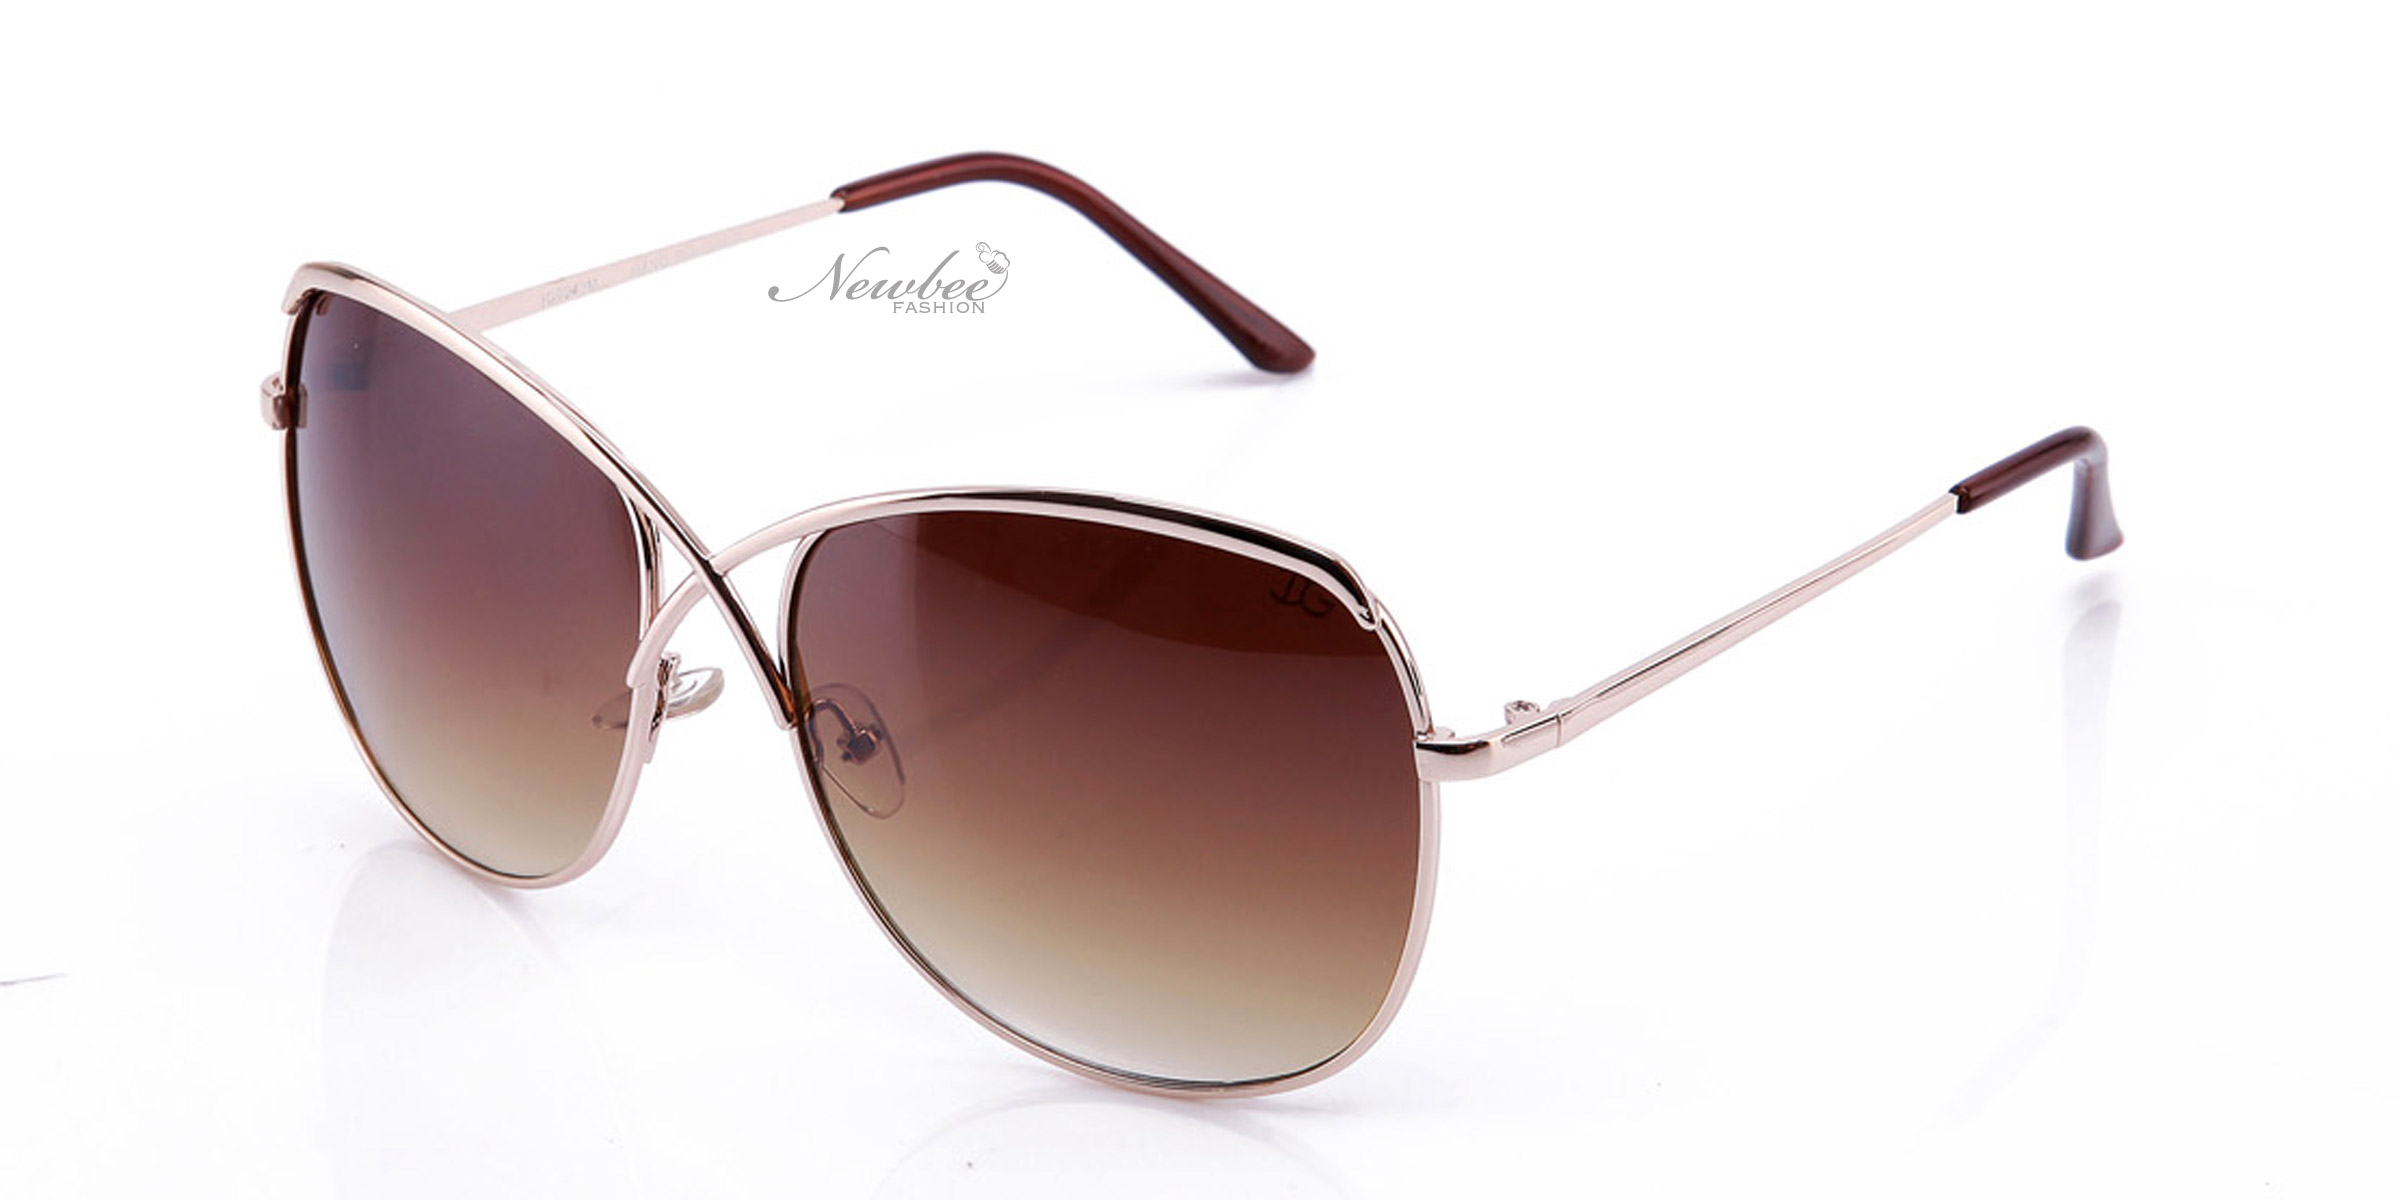 Women Classy Rounded Sunglasses Fashionable Unique Design